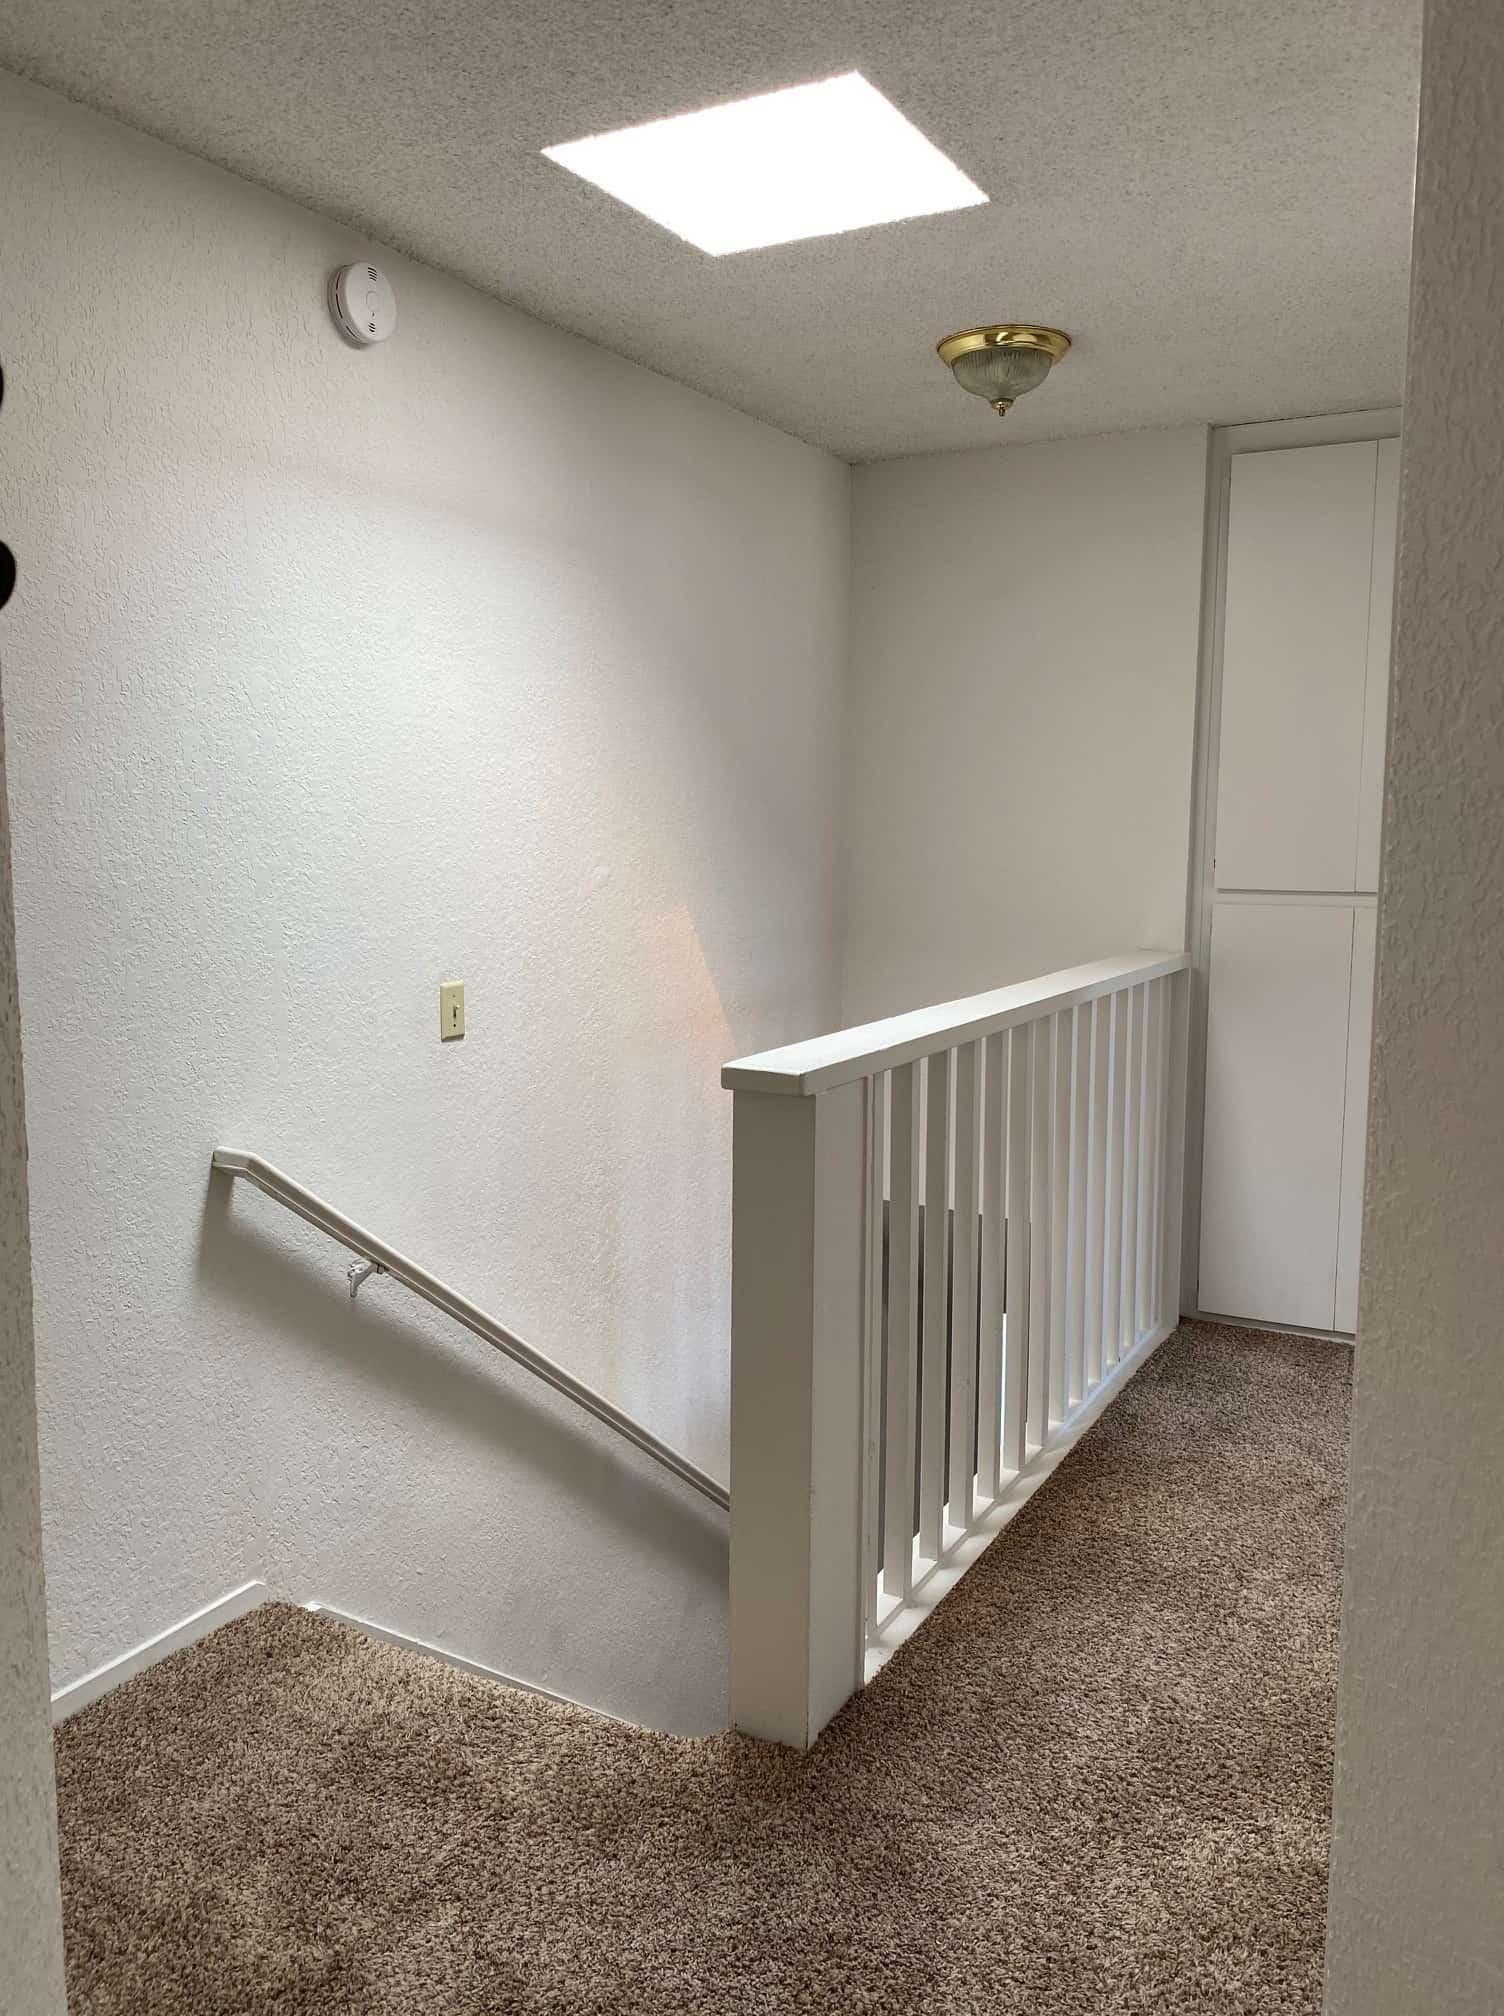 2801 Johnson #2 Upstairs landing 2